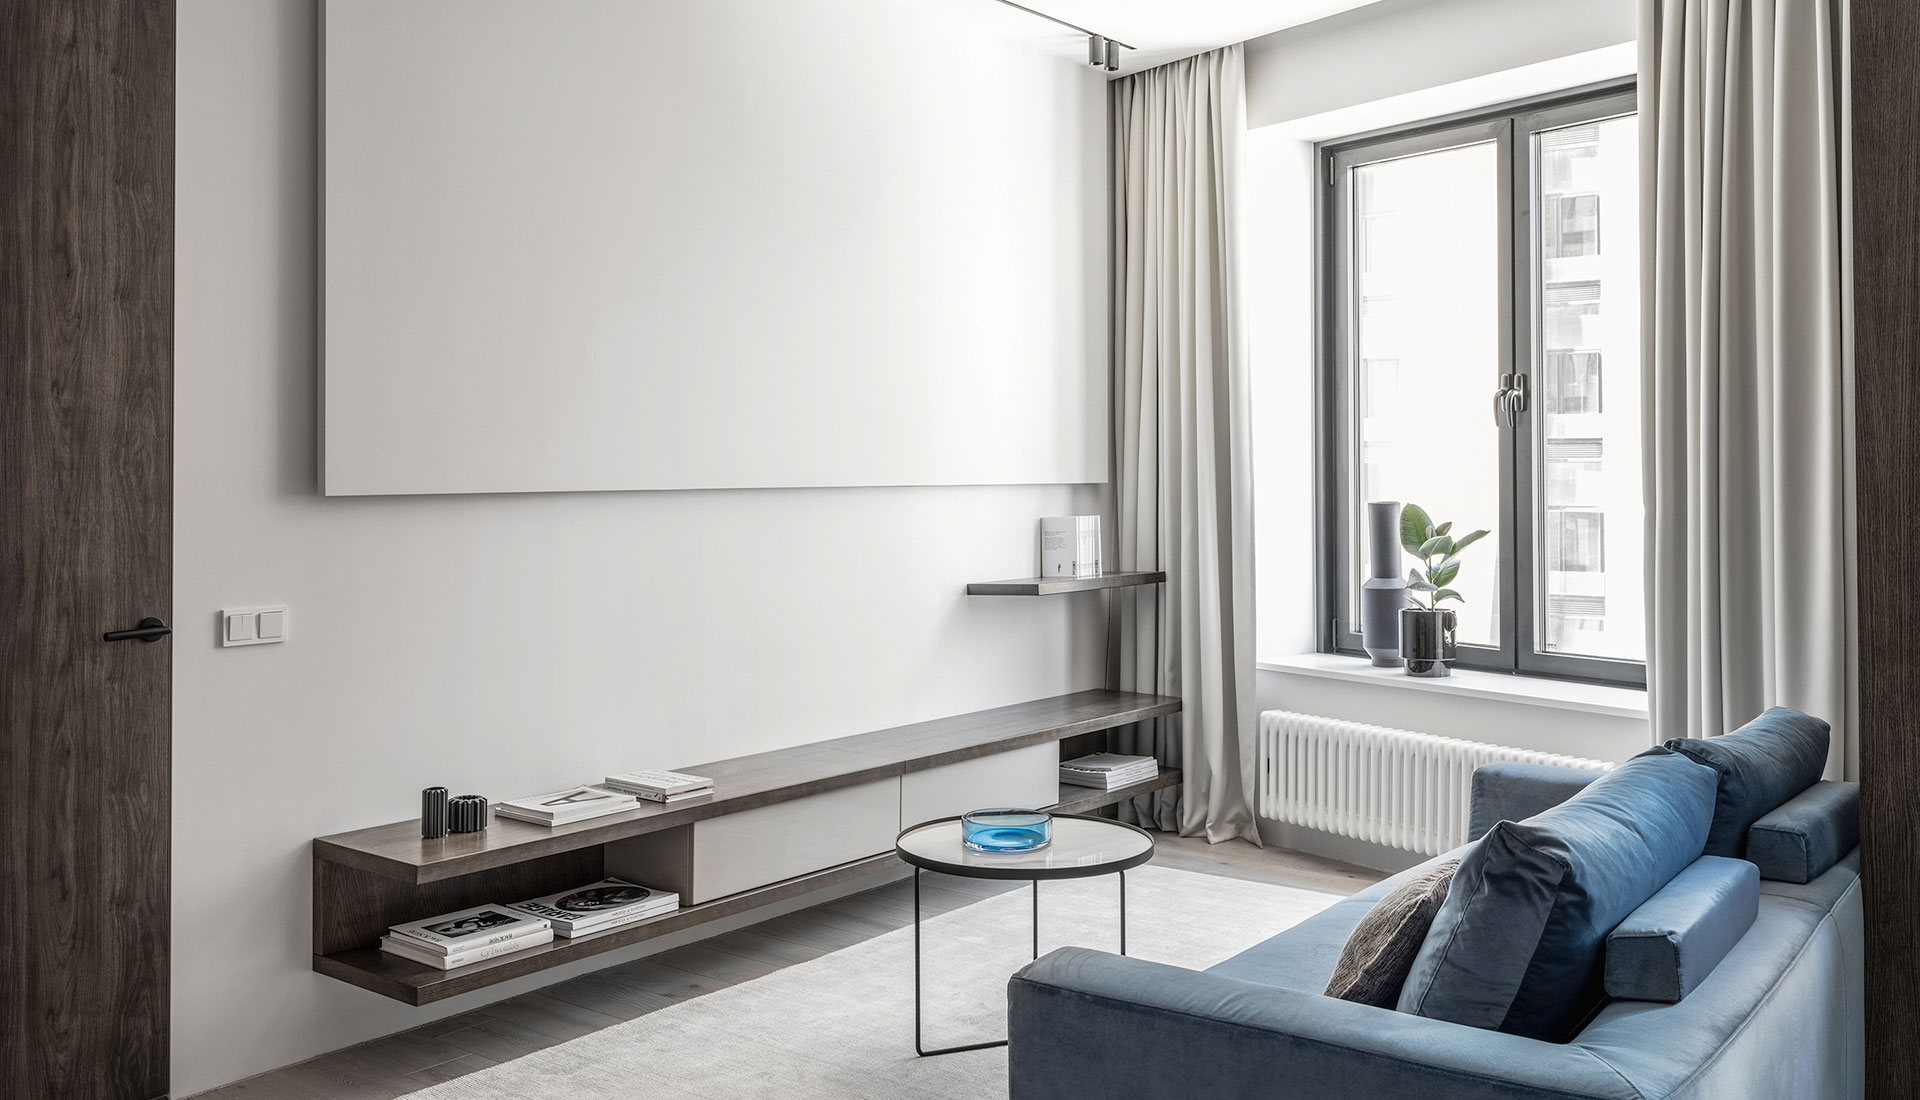 Артем Бабаянц: квартира 60 кв. метров  для сдачи в аренду